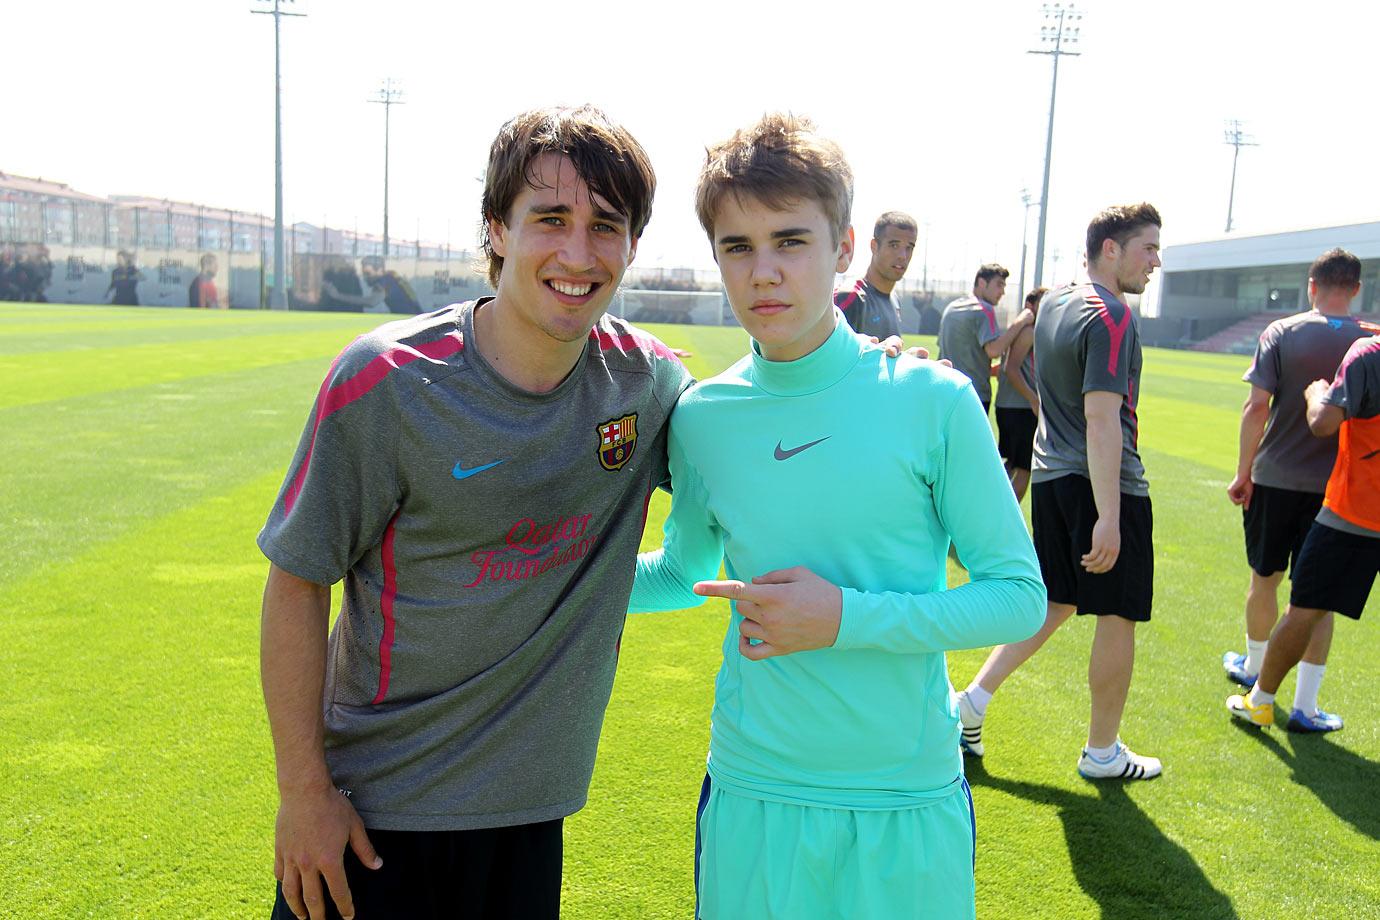 April 9, 2011: FC Barcelona training session in Barcelona, Spain